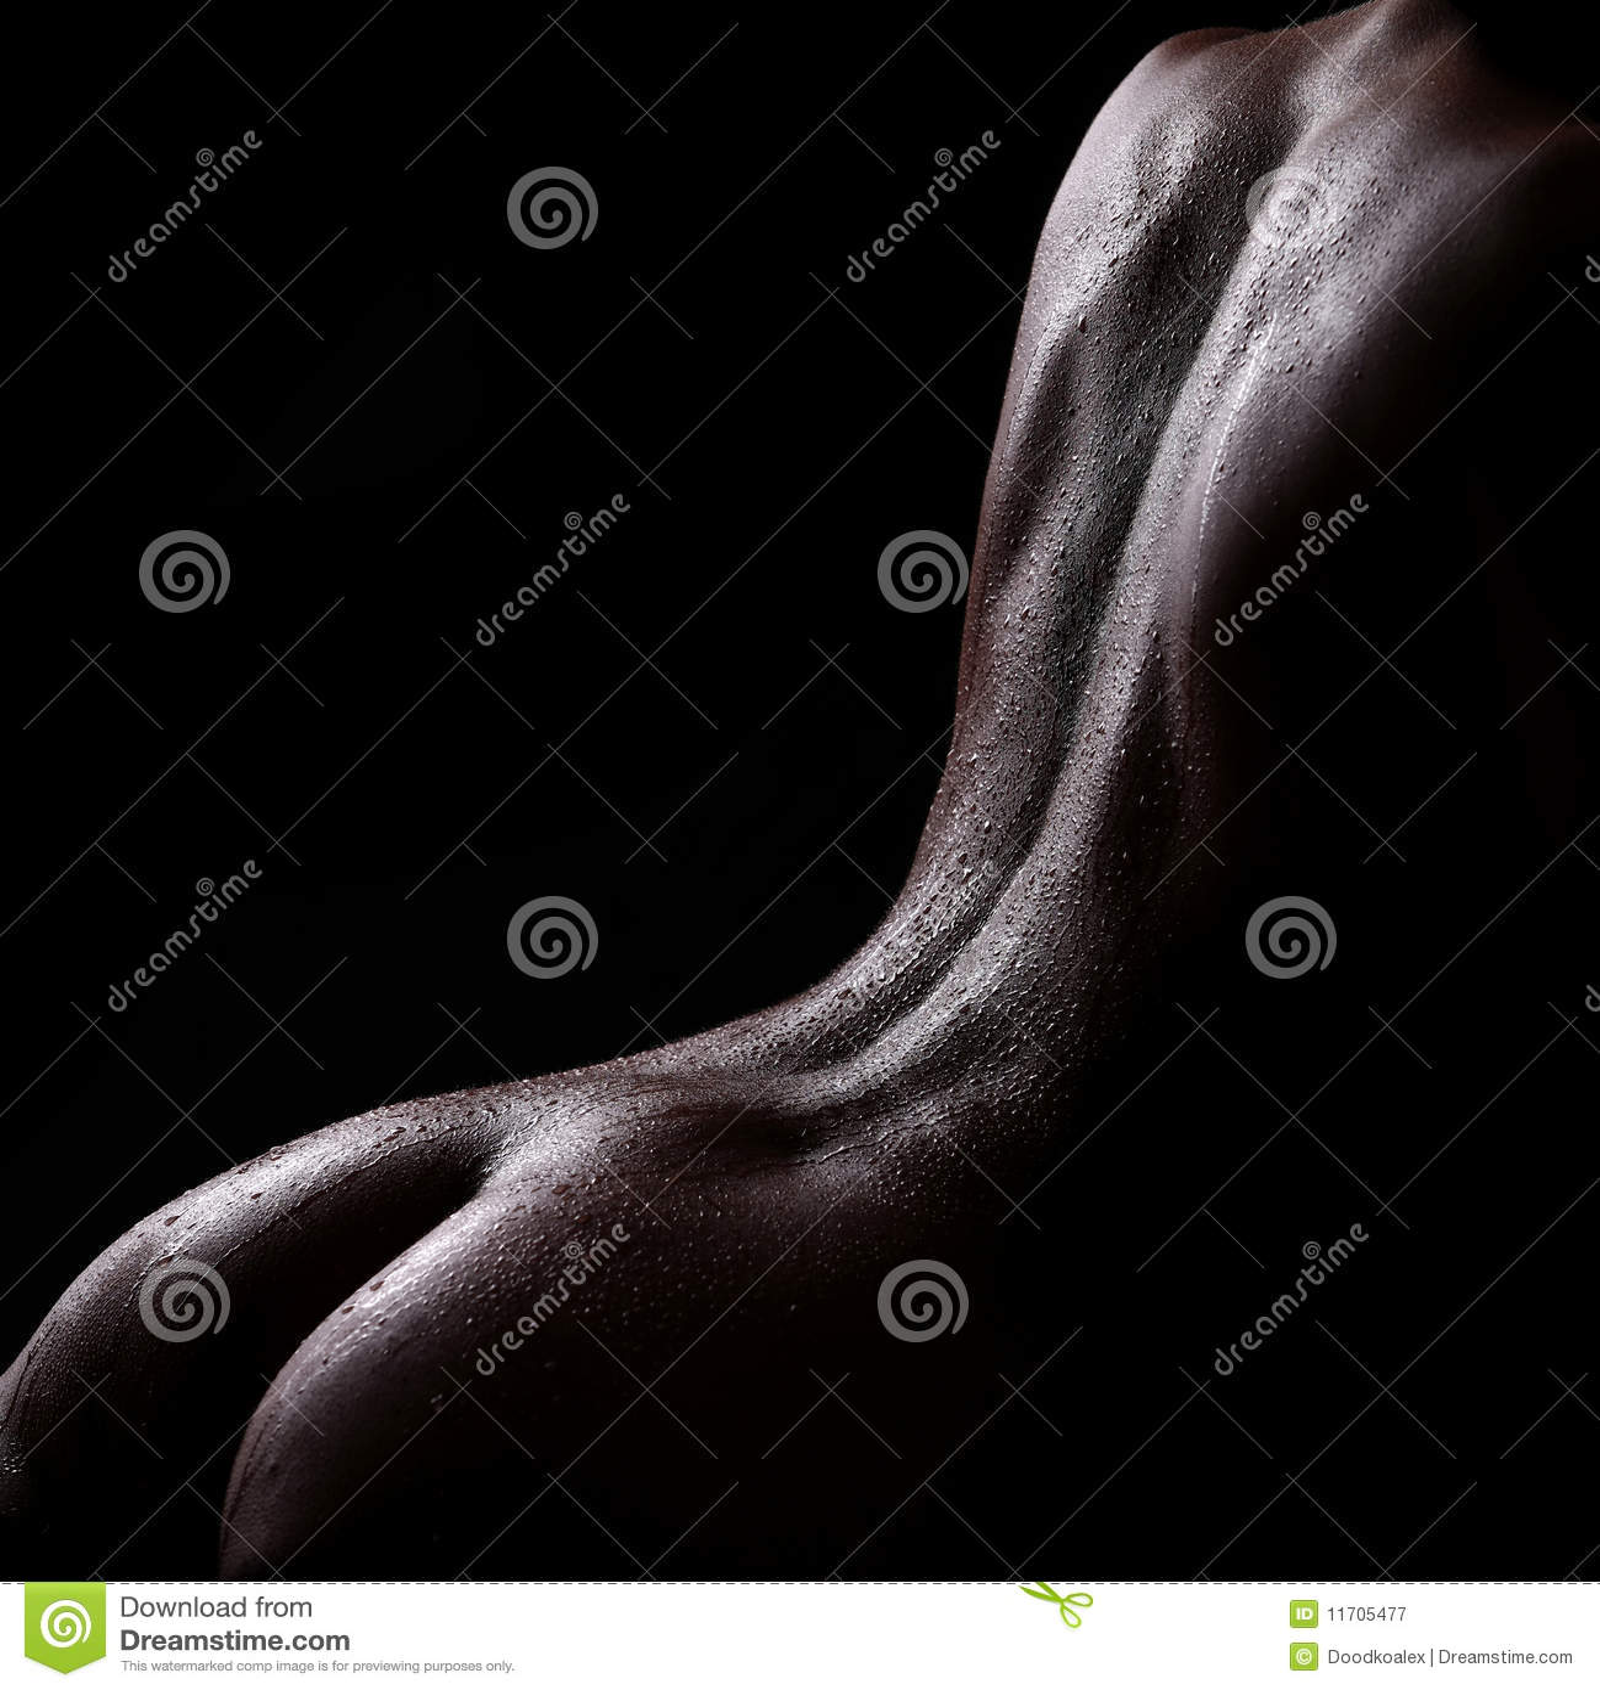 Fondos de pantalla de mujer desnuda Nude Photos 33